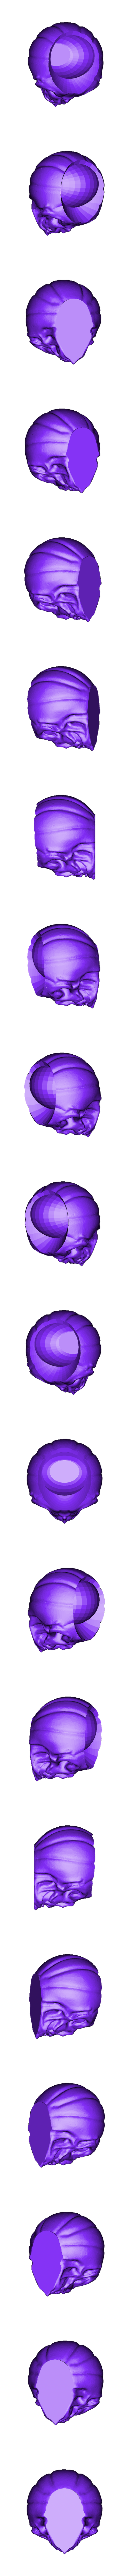 SkullBowl 3.stl Download STL file Skull Pumpkin Bundle • Design to 3D print, Thomllama